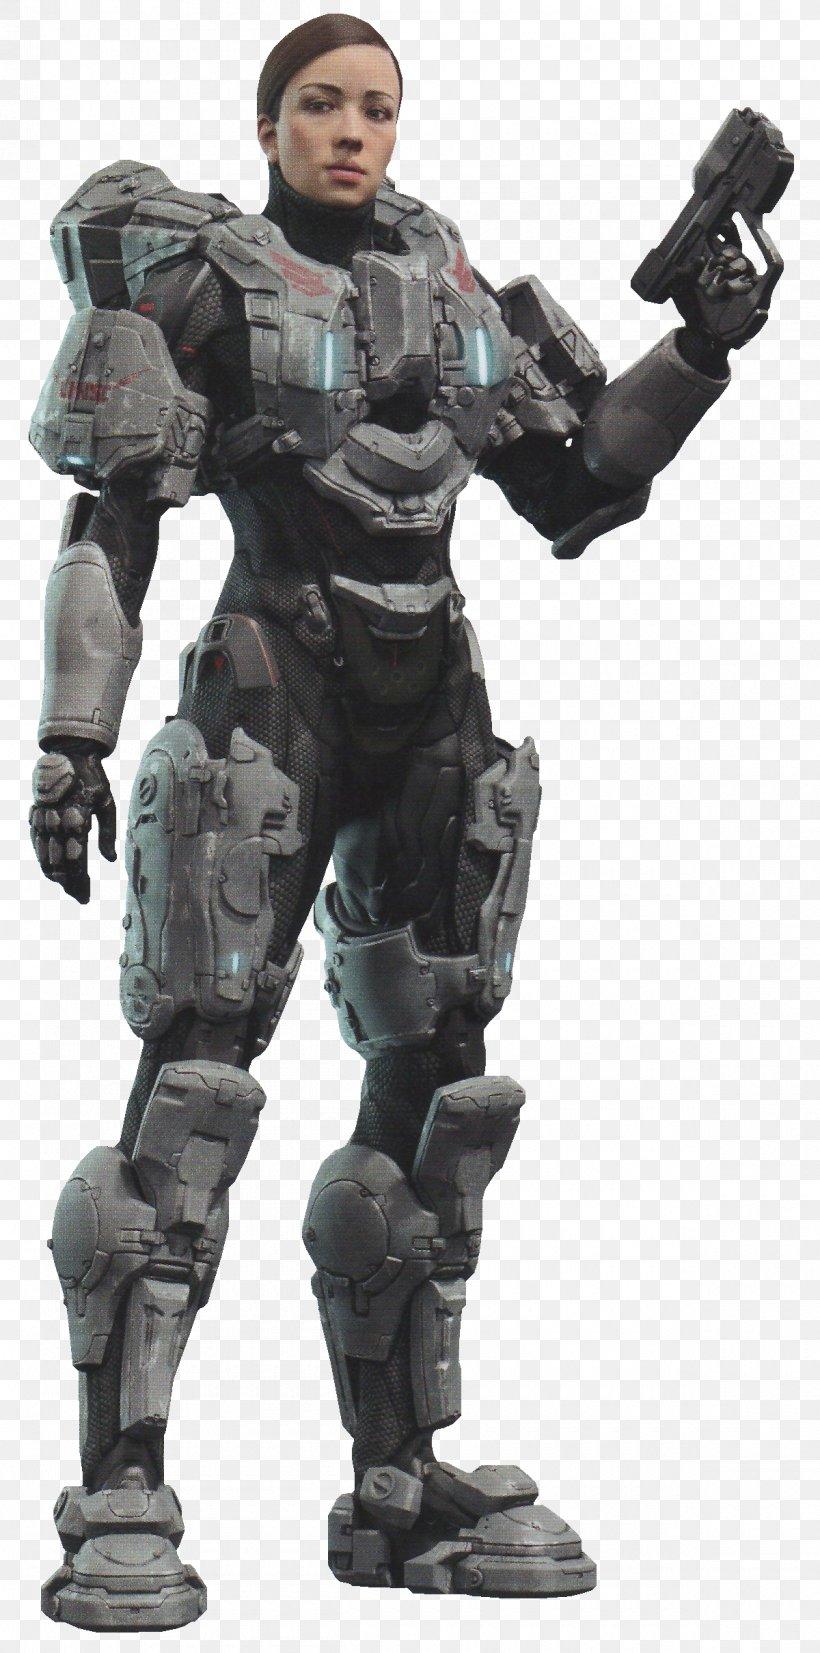 Halo 4 Halo 5 Guardians Cortana Halo Combat Evolved